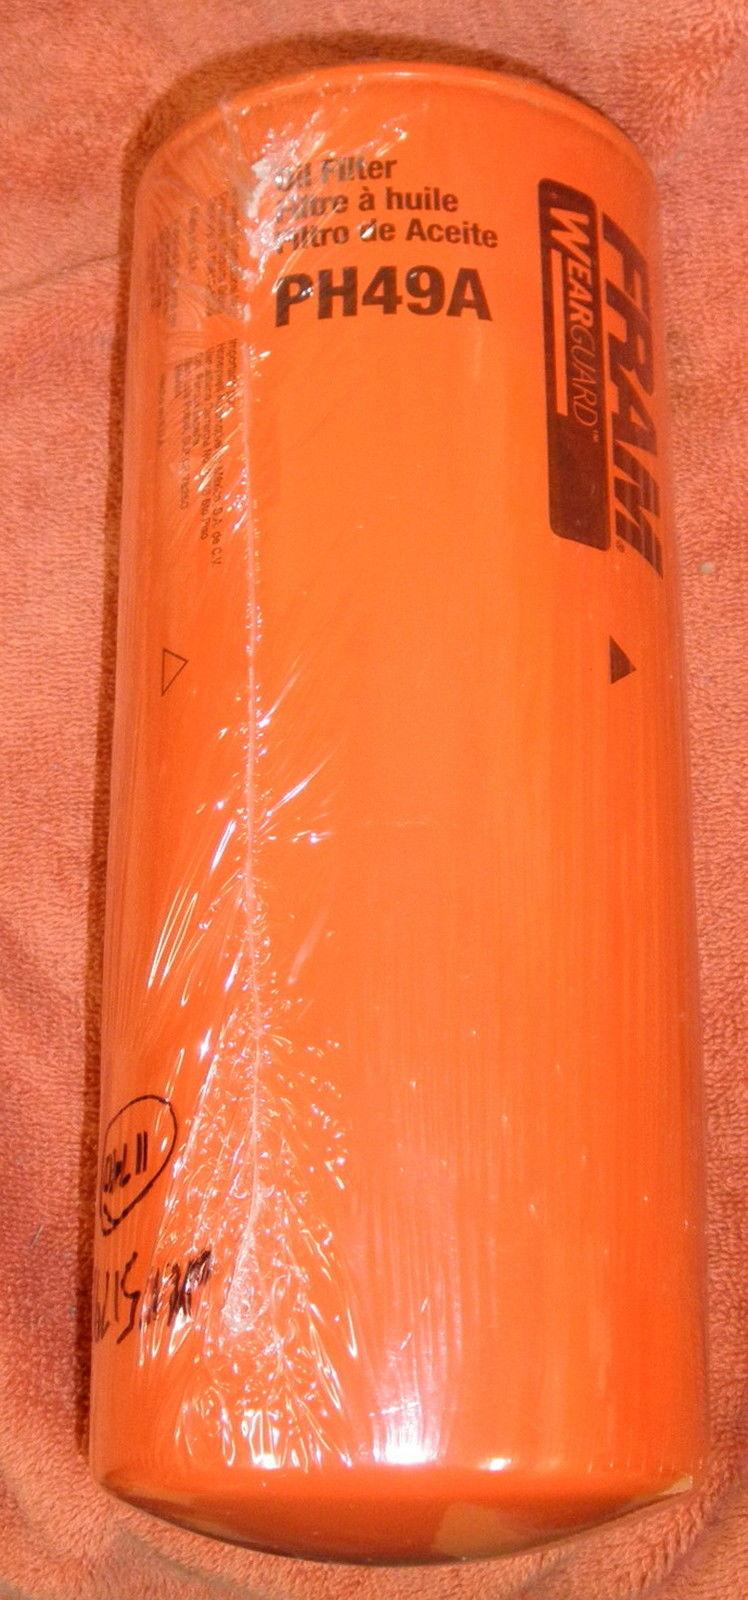 hight resolution of fram ph49a wix 51791diesel engine oil filter cat 3126b c7 3306 3304 3116 3046